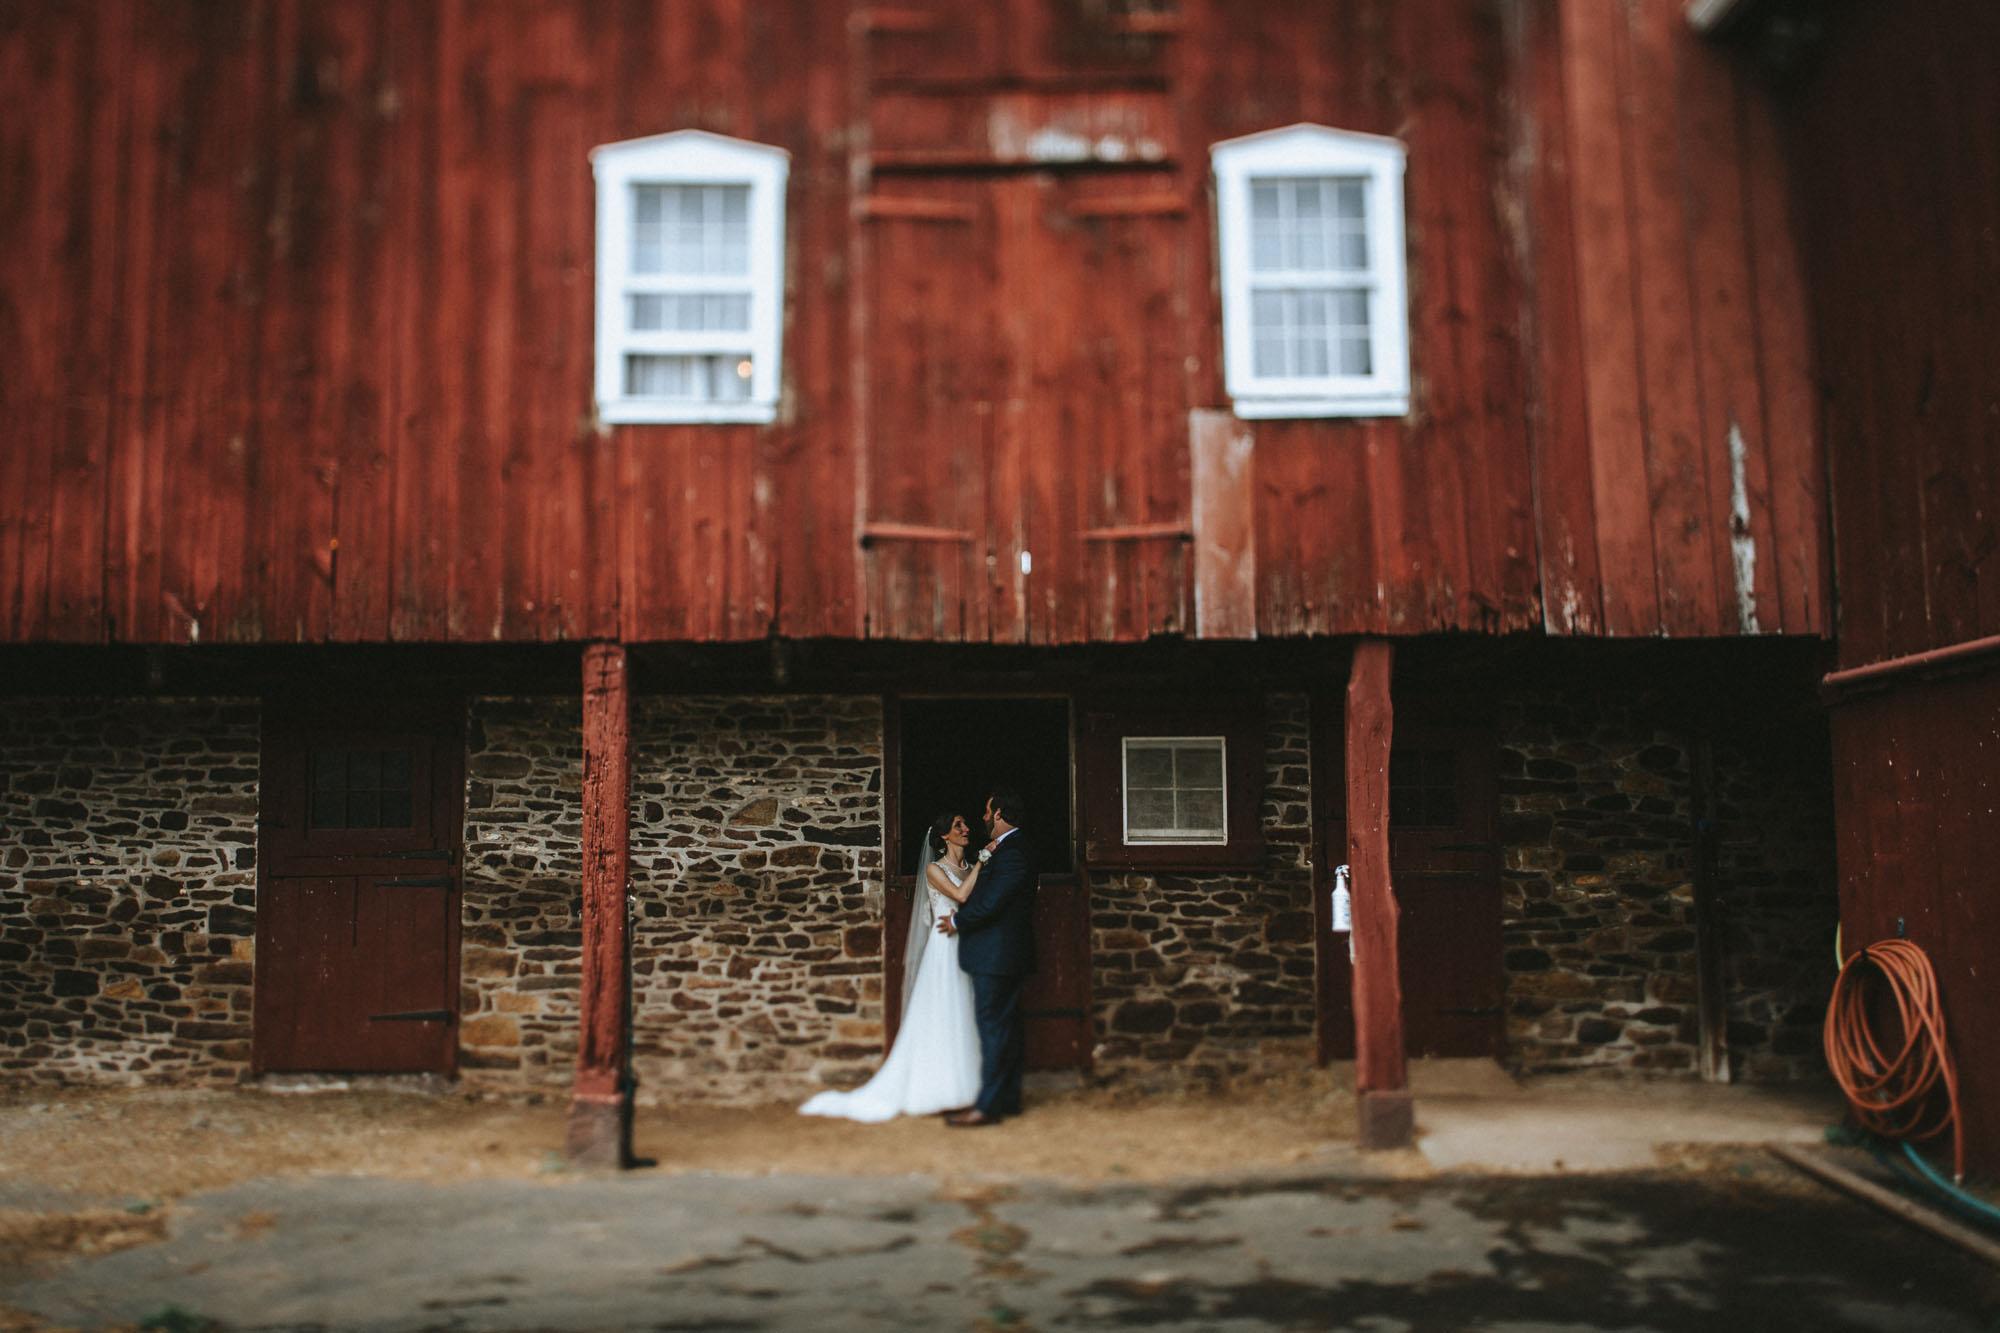 Twisted-Oaks-Studio-Arianne-Sean-Wedding-229.jpg